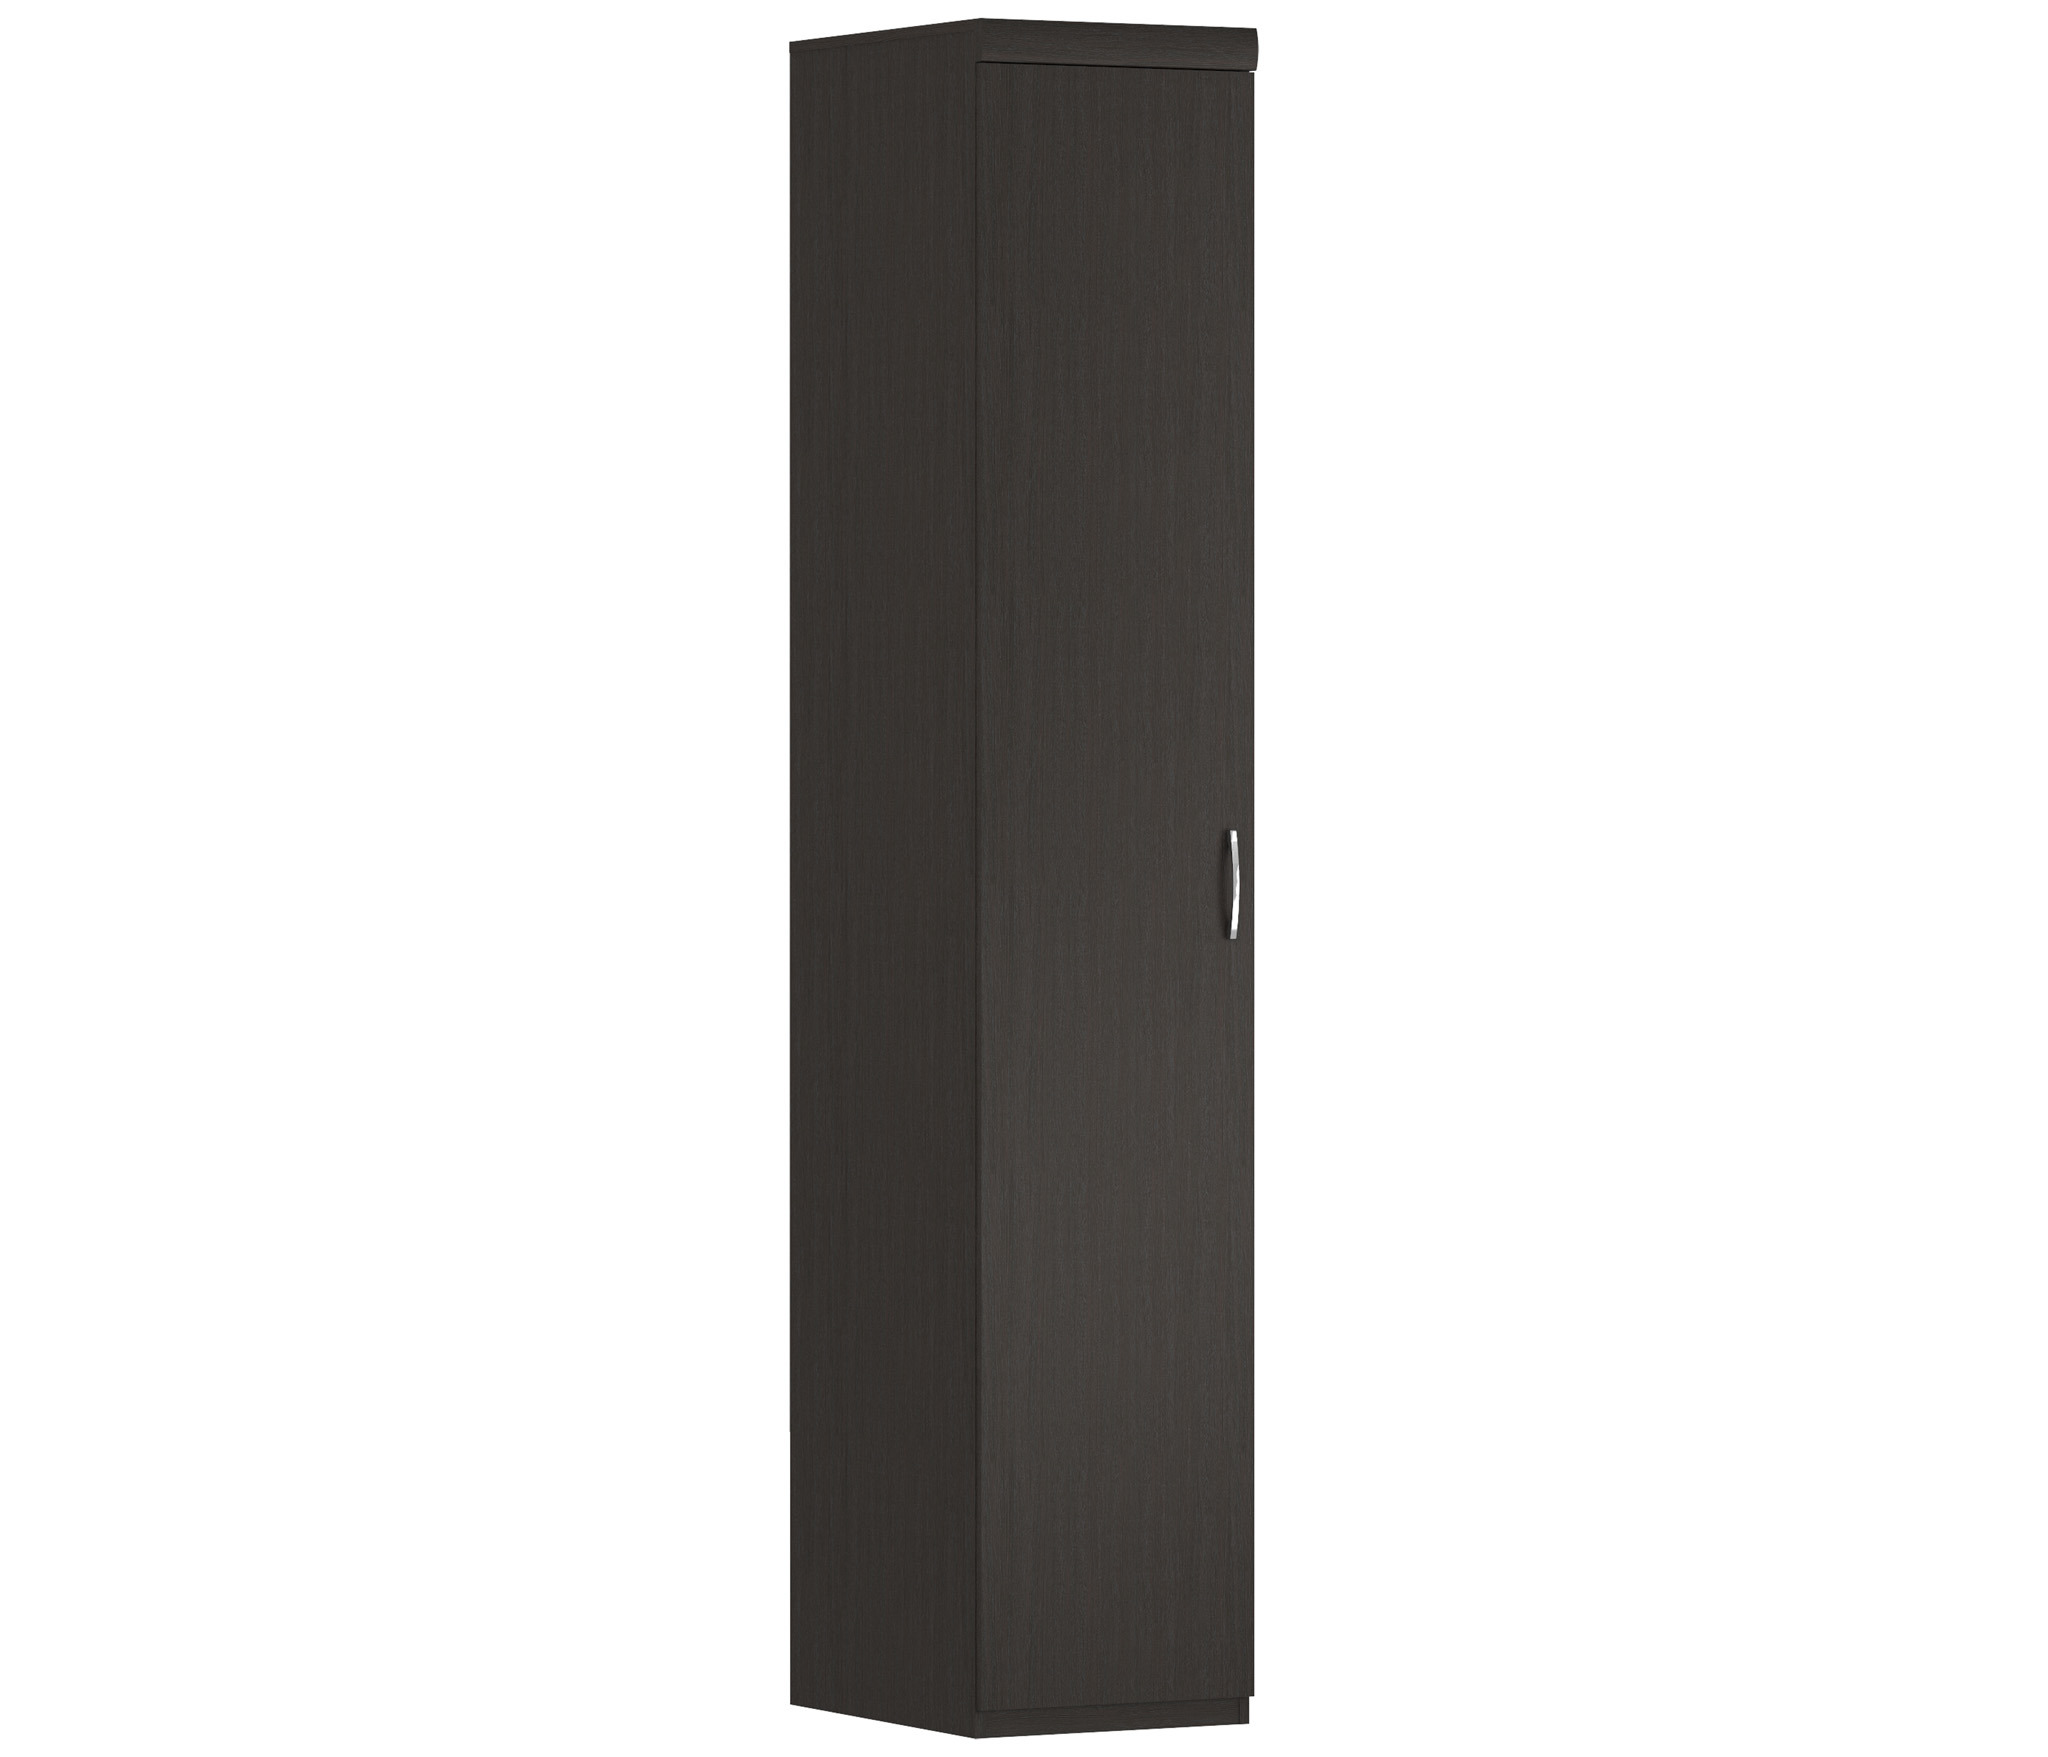 Соната СБ-2482 Шкаф 1-о дверныйШкафы<br><br><br>Длина мм: 440<br>Высота мм: 2384<br>Глубина мм: 581